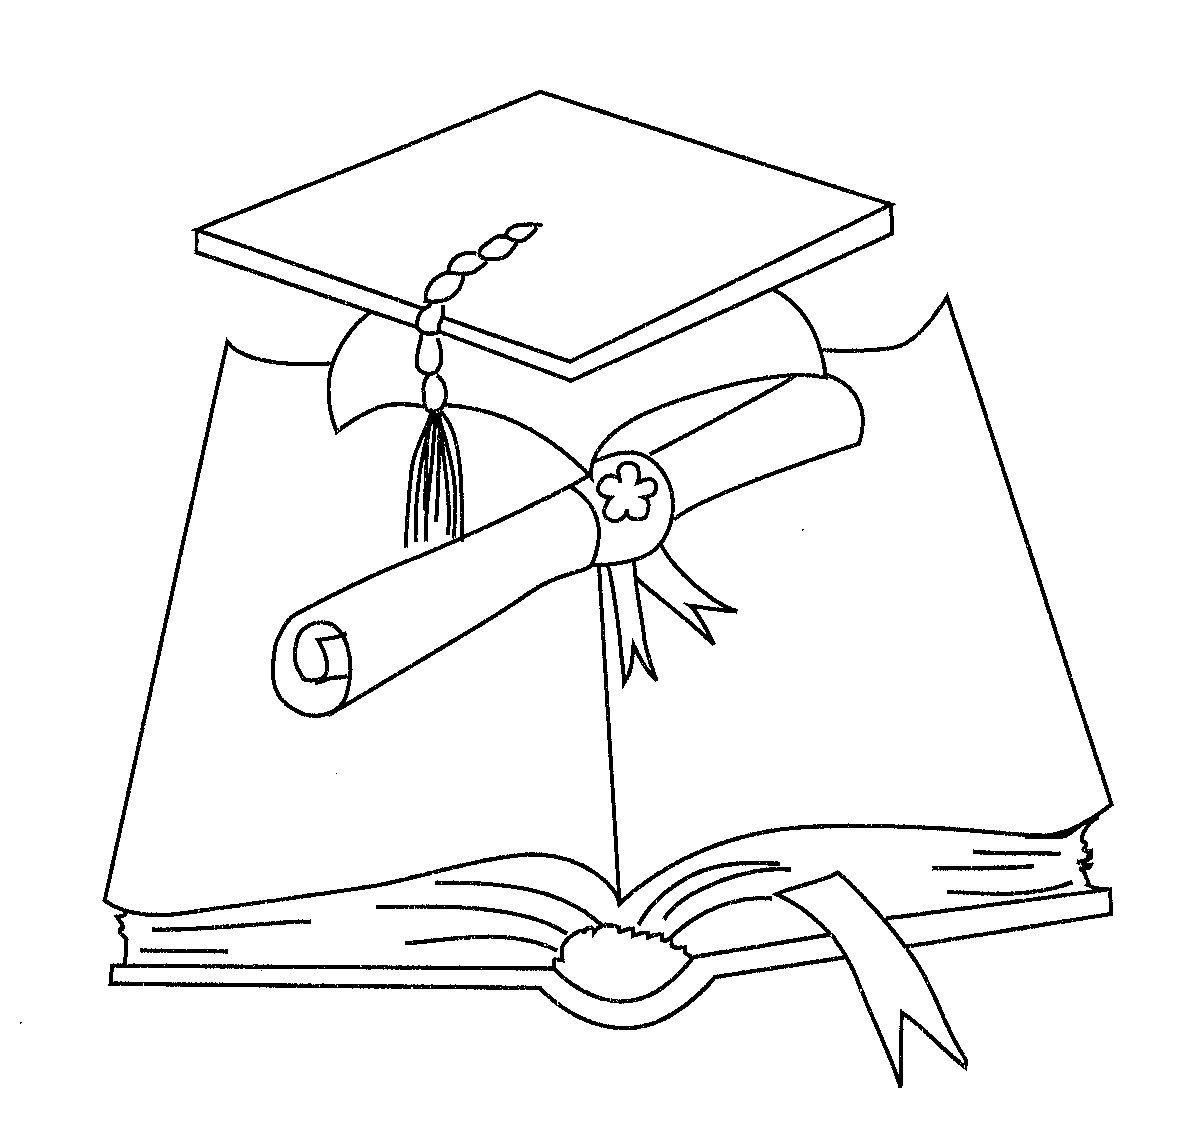 Pics photos how to draw a graduation hat - Moldes De Tarjetas De Graduacion Para Imprimir Buscar Con Google